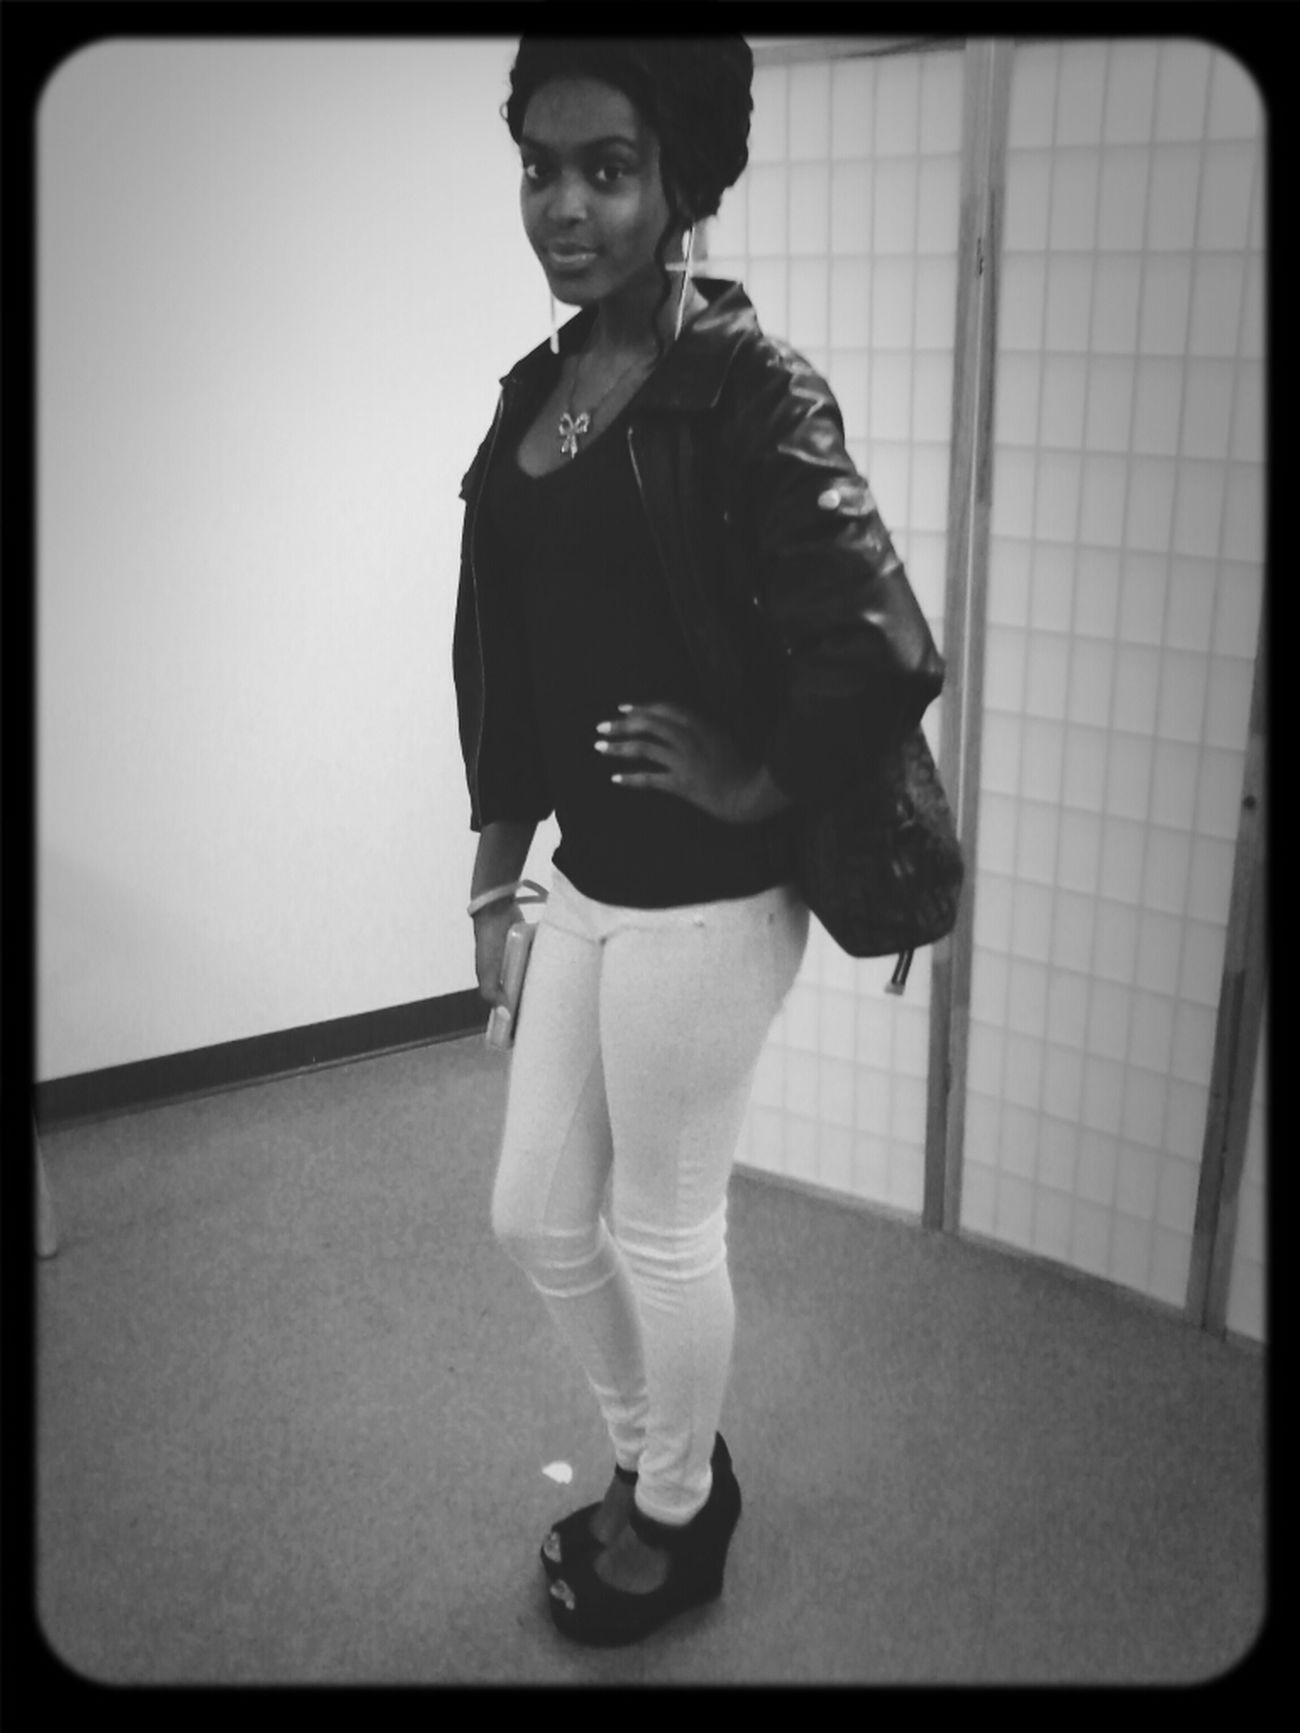 Posing